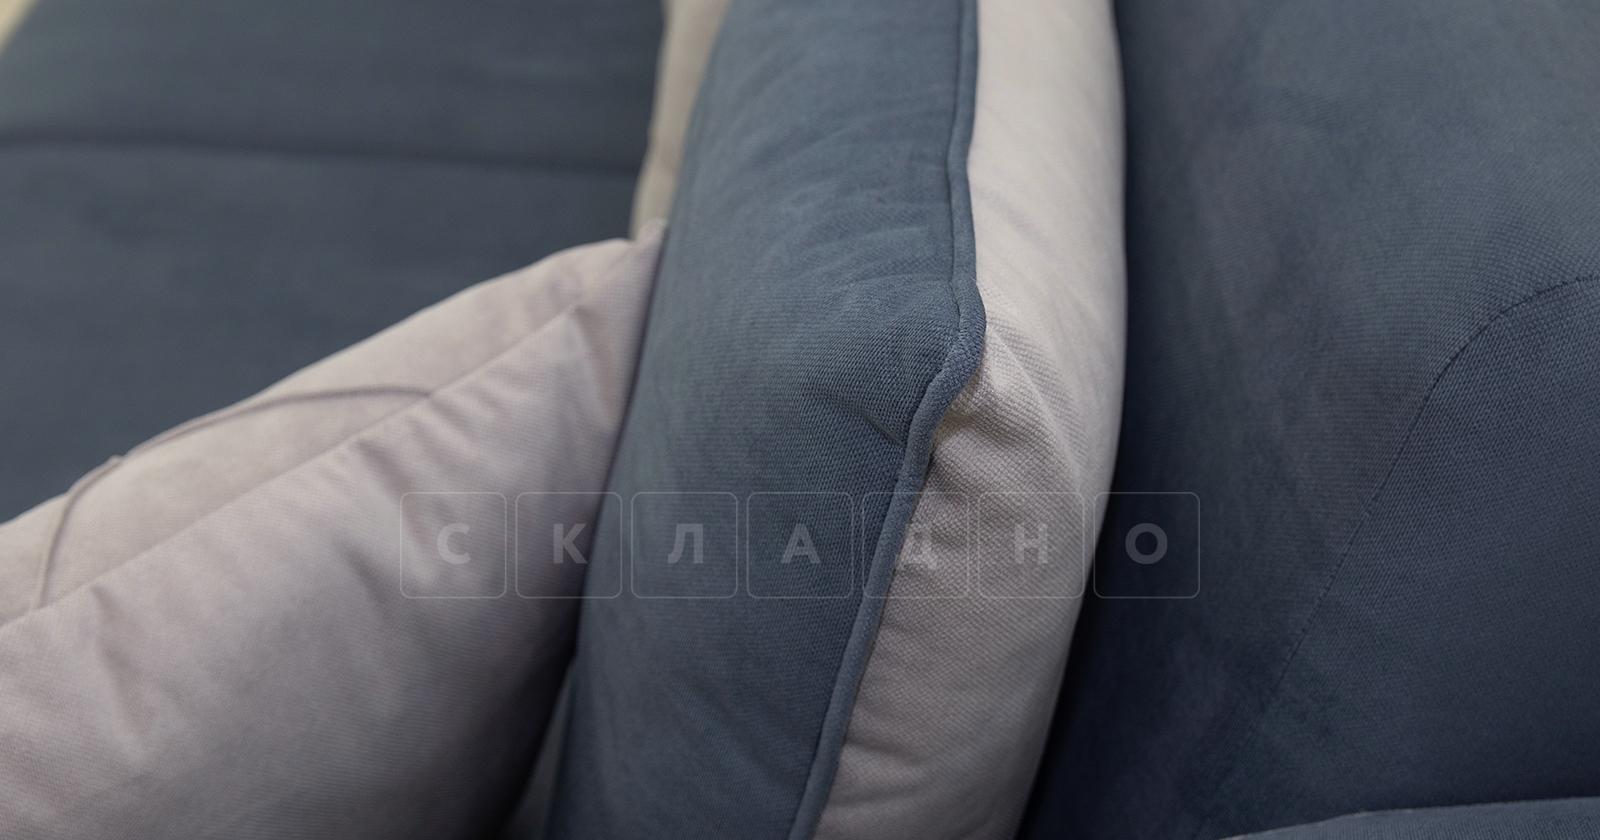 Диван-кровать Флэтфорд серо-синий фото 9 | интернет-магазин Складно